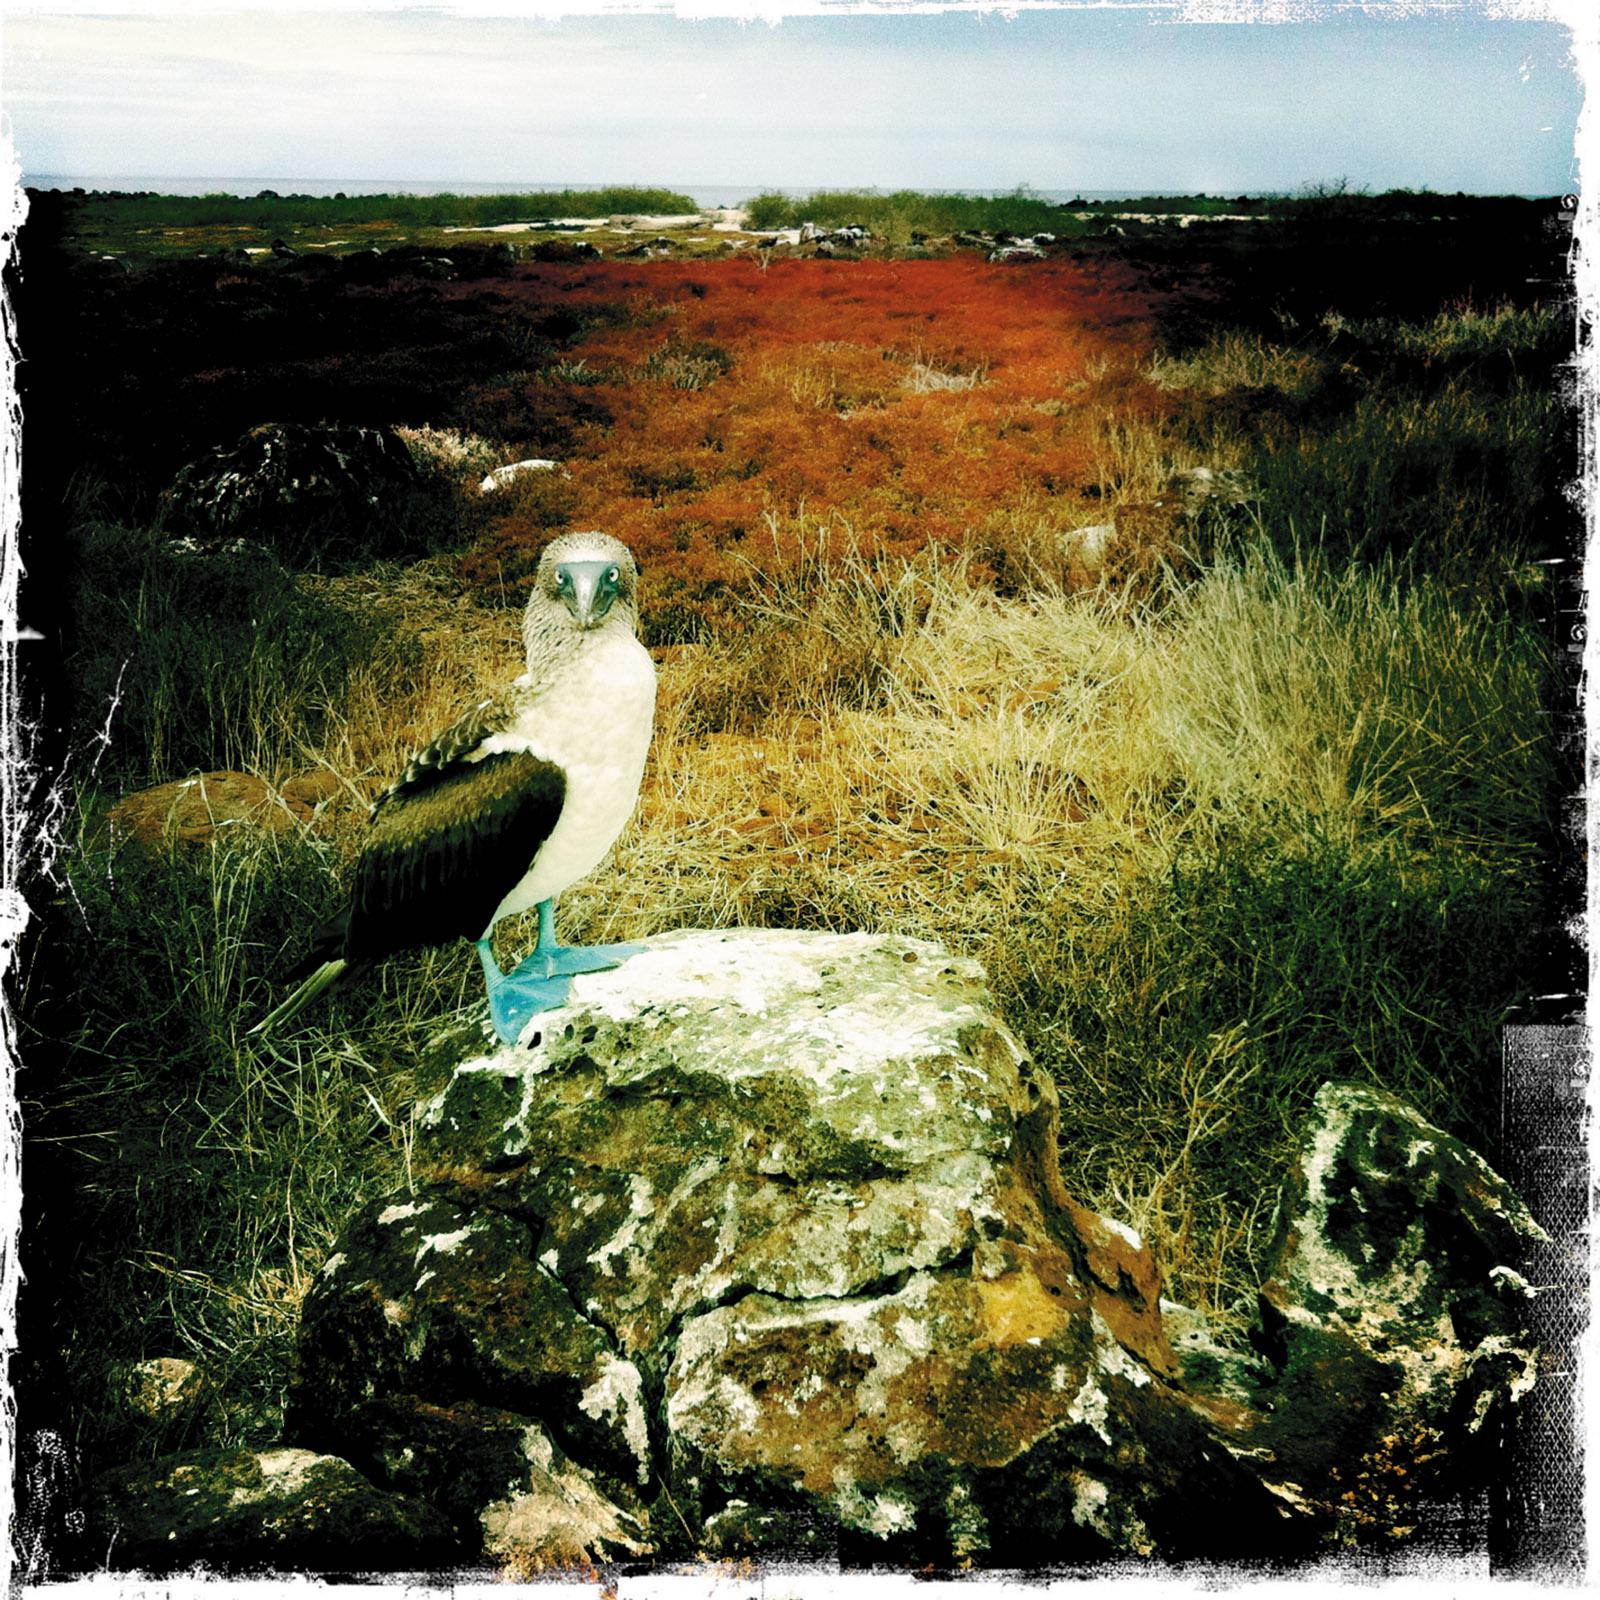 Blue-footed booby, Galápagos Islands, 2012